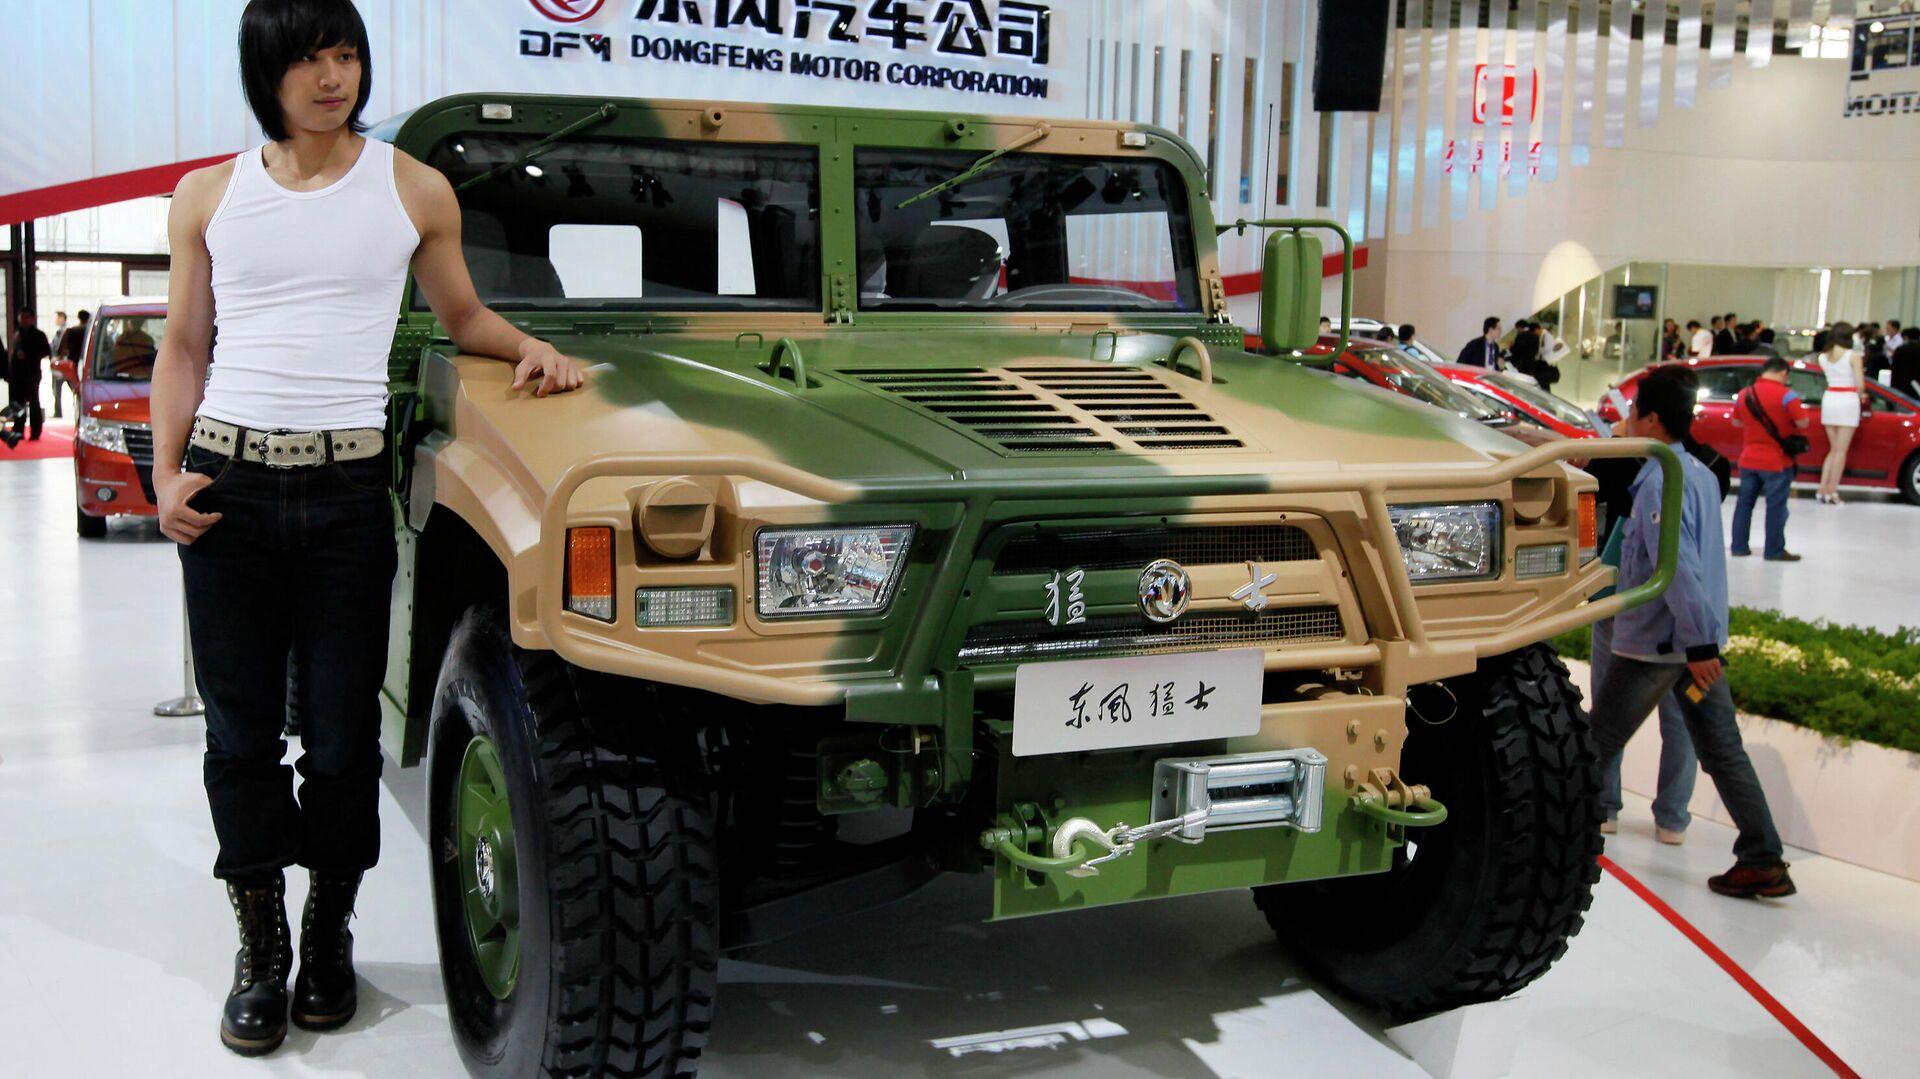 Una persona posa al lado del 'Hummer' militar de Dongfeng Motor, en el Salón Internacional del Automóvil de Shanghai de 2009 - Sputnik Mundo, 1920, 12.07.2021